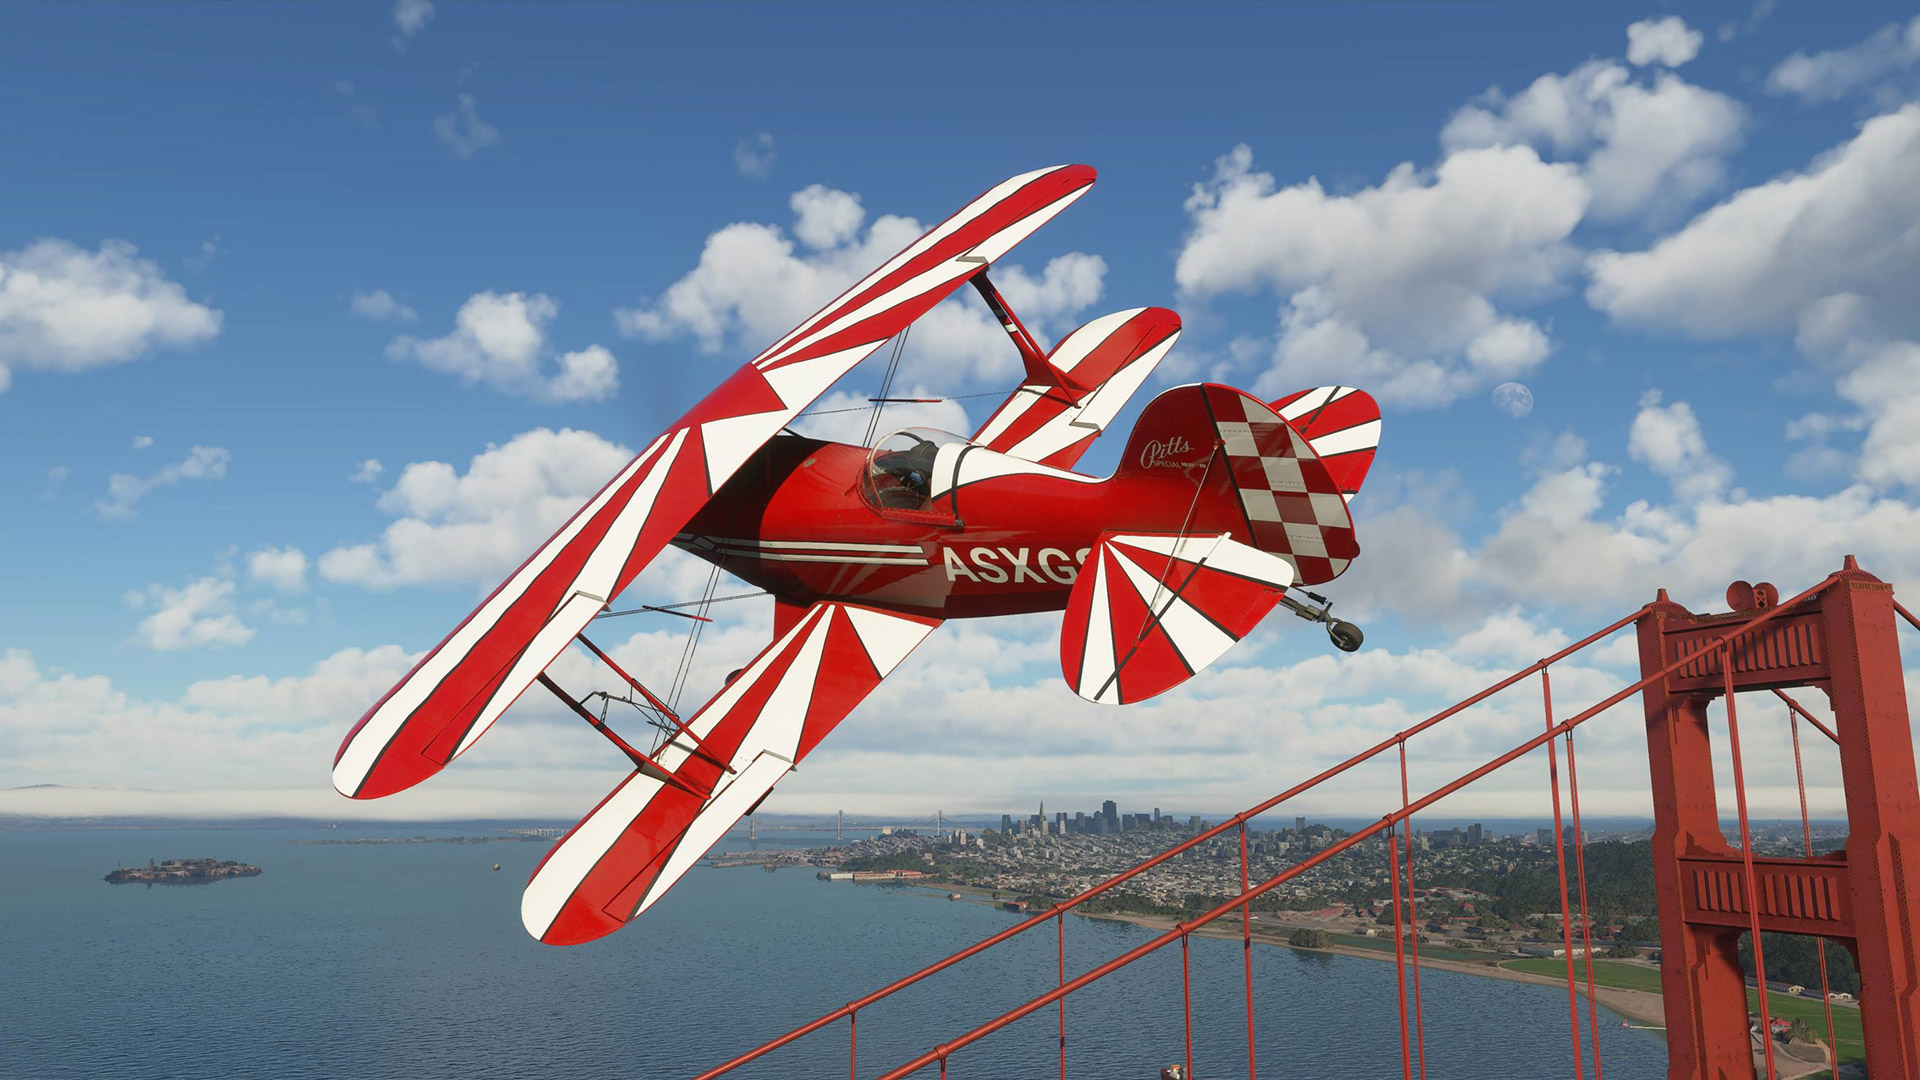 Microsoft Flight Simulator (2020) Wallpaper in 1920x1080